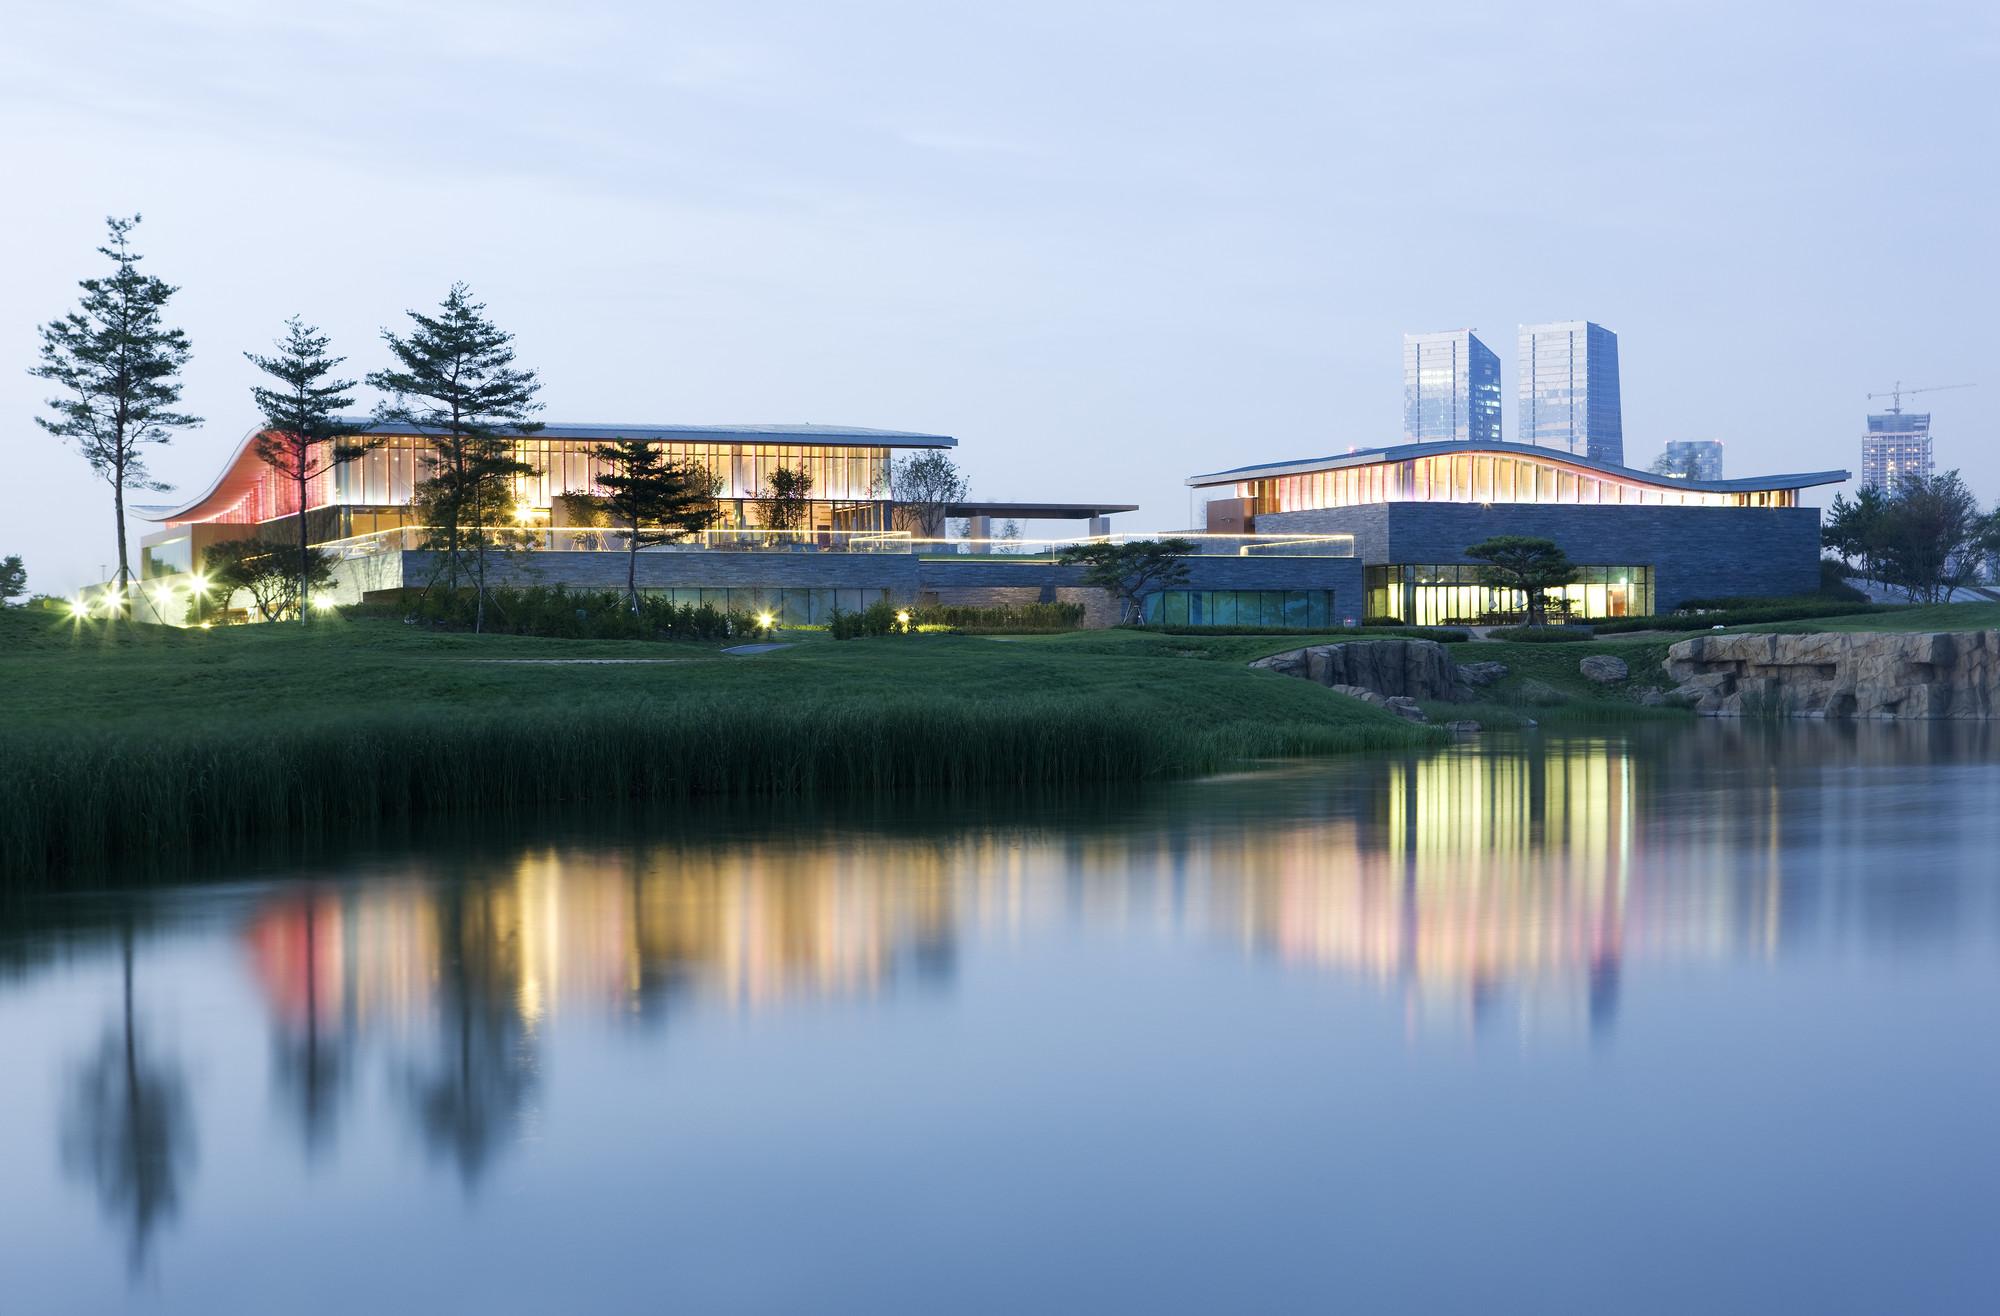 Jack Nicklaus Golf Club / Yazdani Studio of CannonDesign